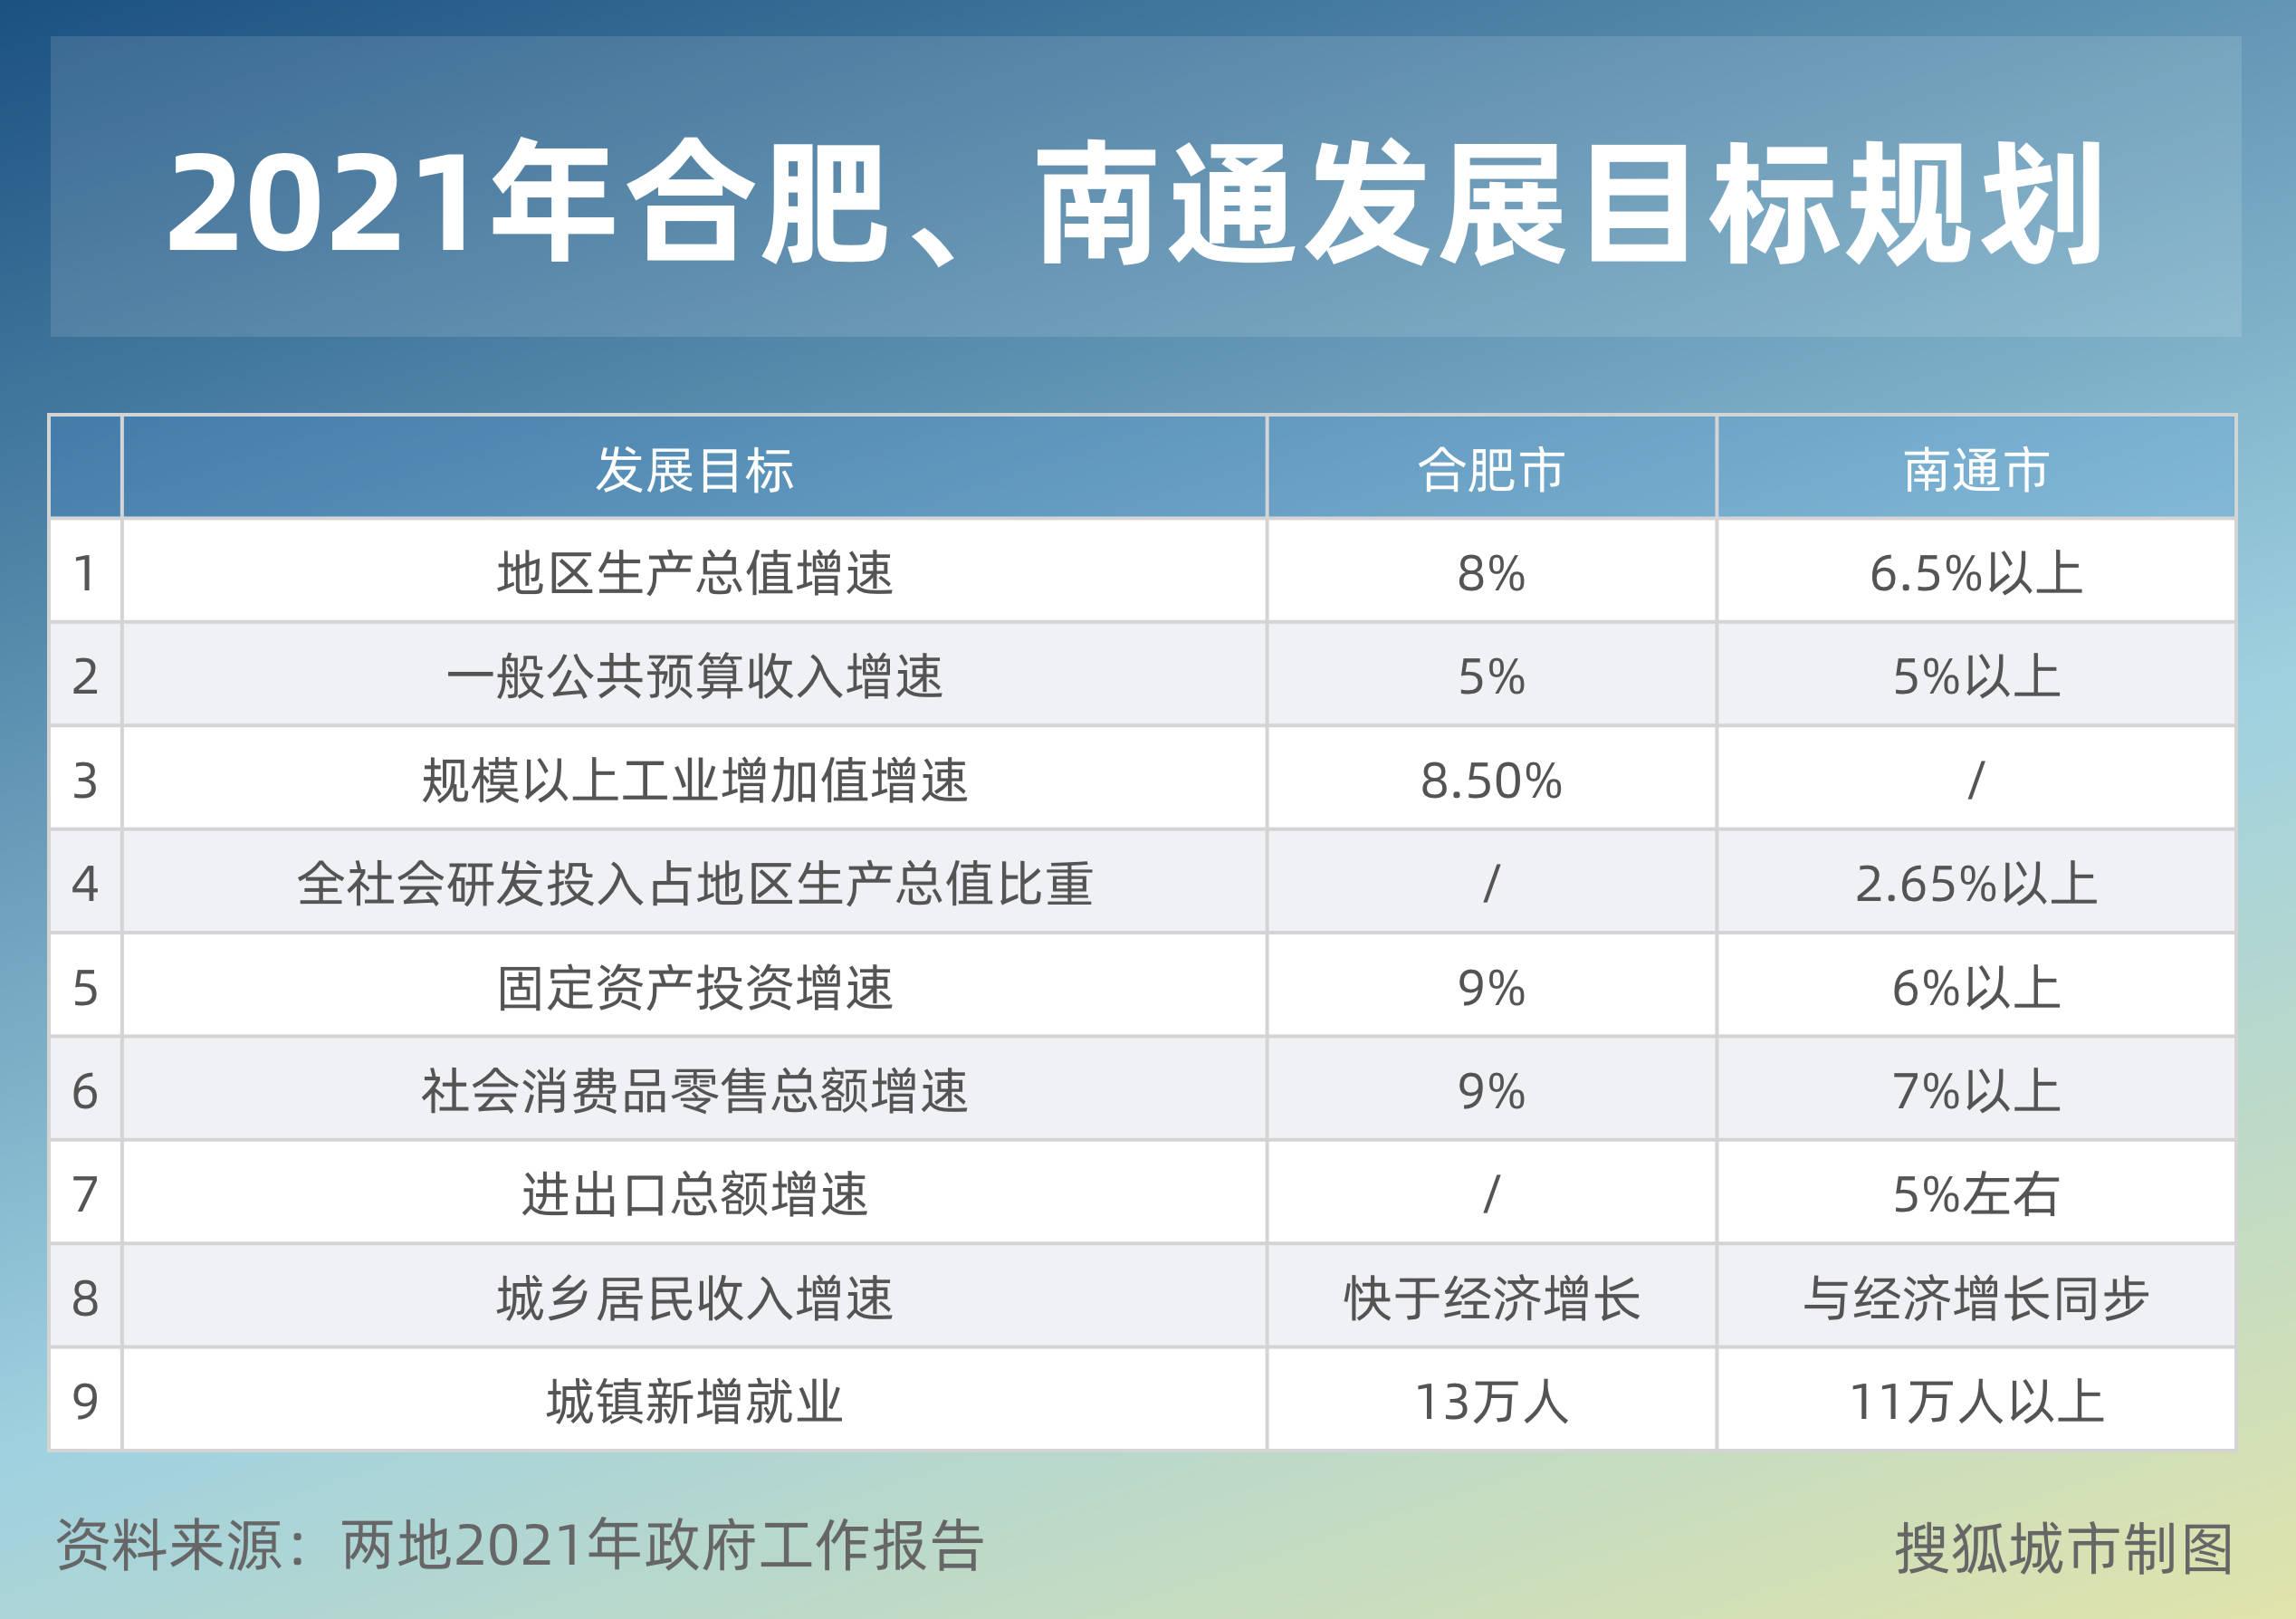 2021GDP计划_2020广东GDP超11万亿 2021计划增长6 以上